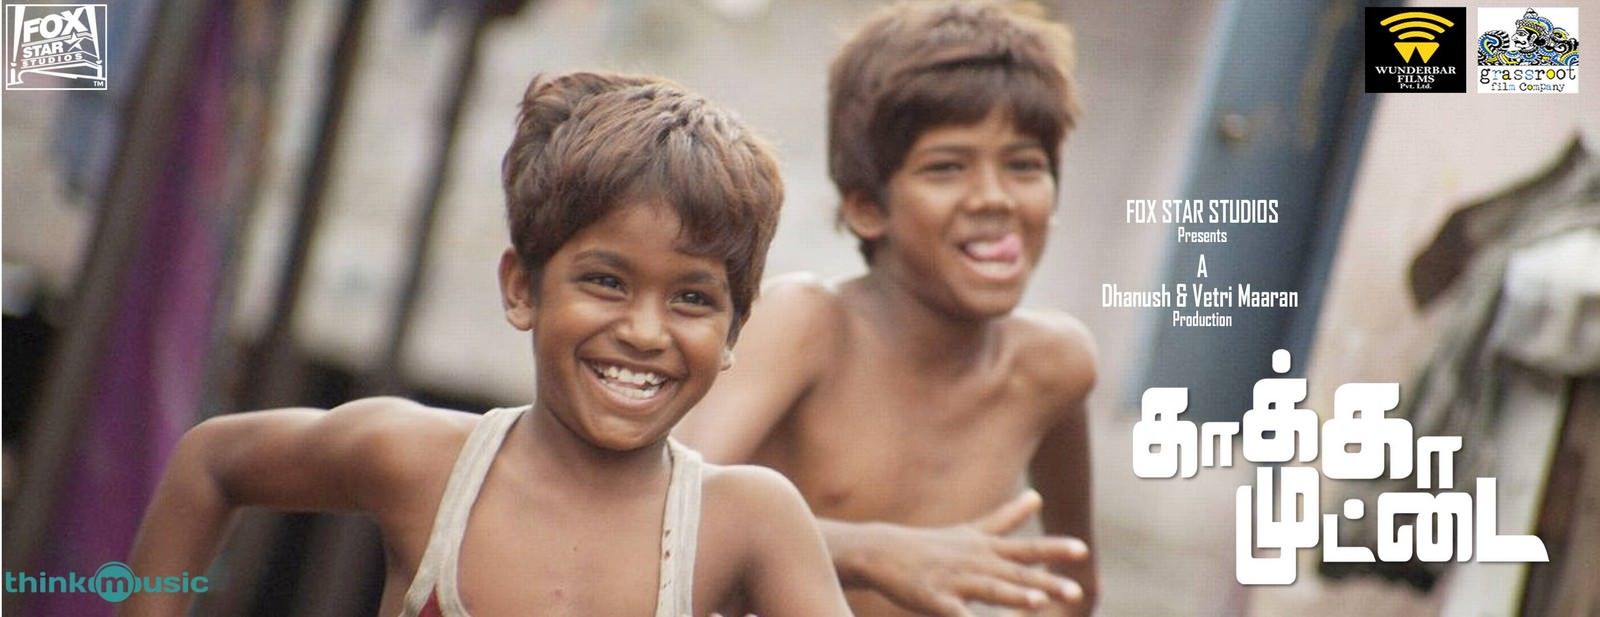 Movie, Kaakkaa Muttai(印度, 2014年) / 披薩的滋味(台灣) / 兩個小孩的Pizza(香港) / Crow's Egg(英文) / 乌鸦蛋(網路), 電影海報, 印度, 橫版